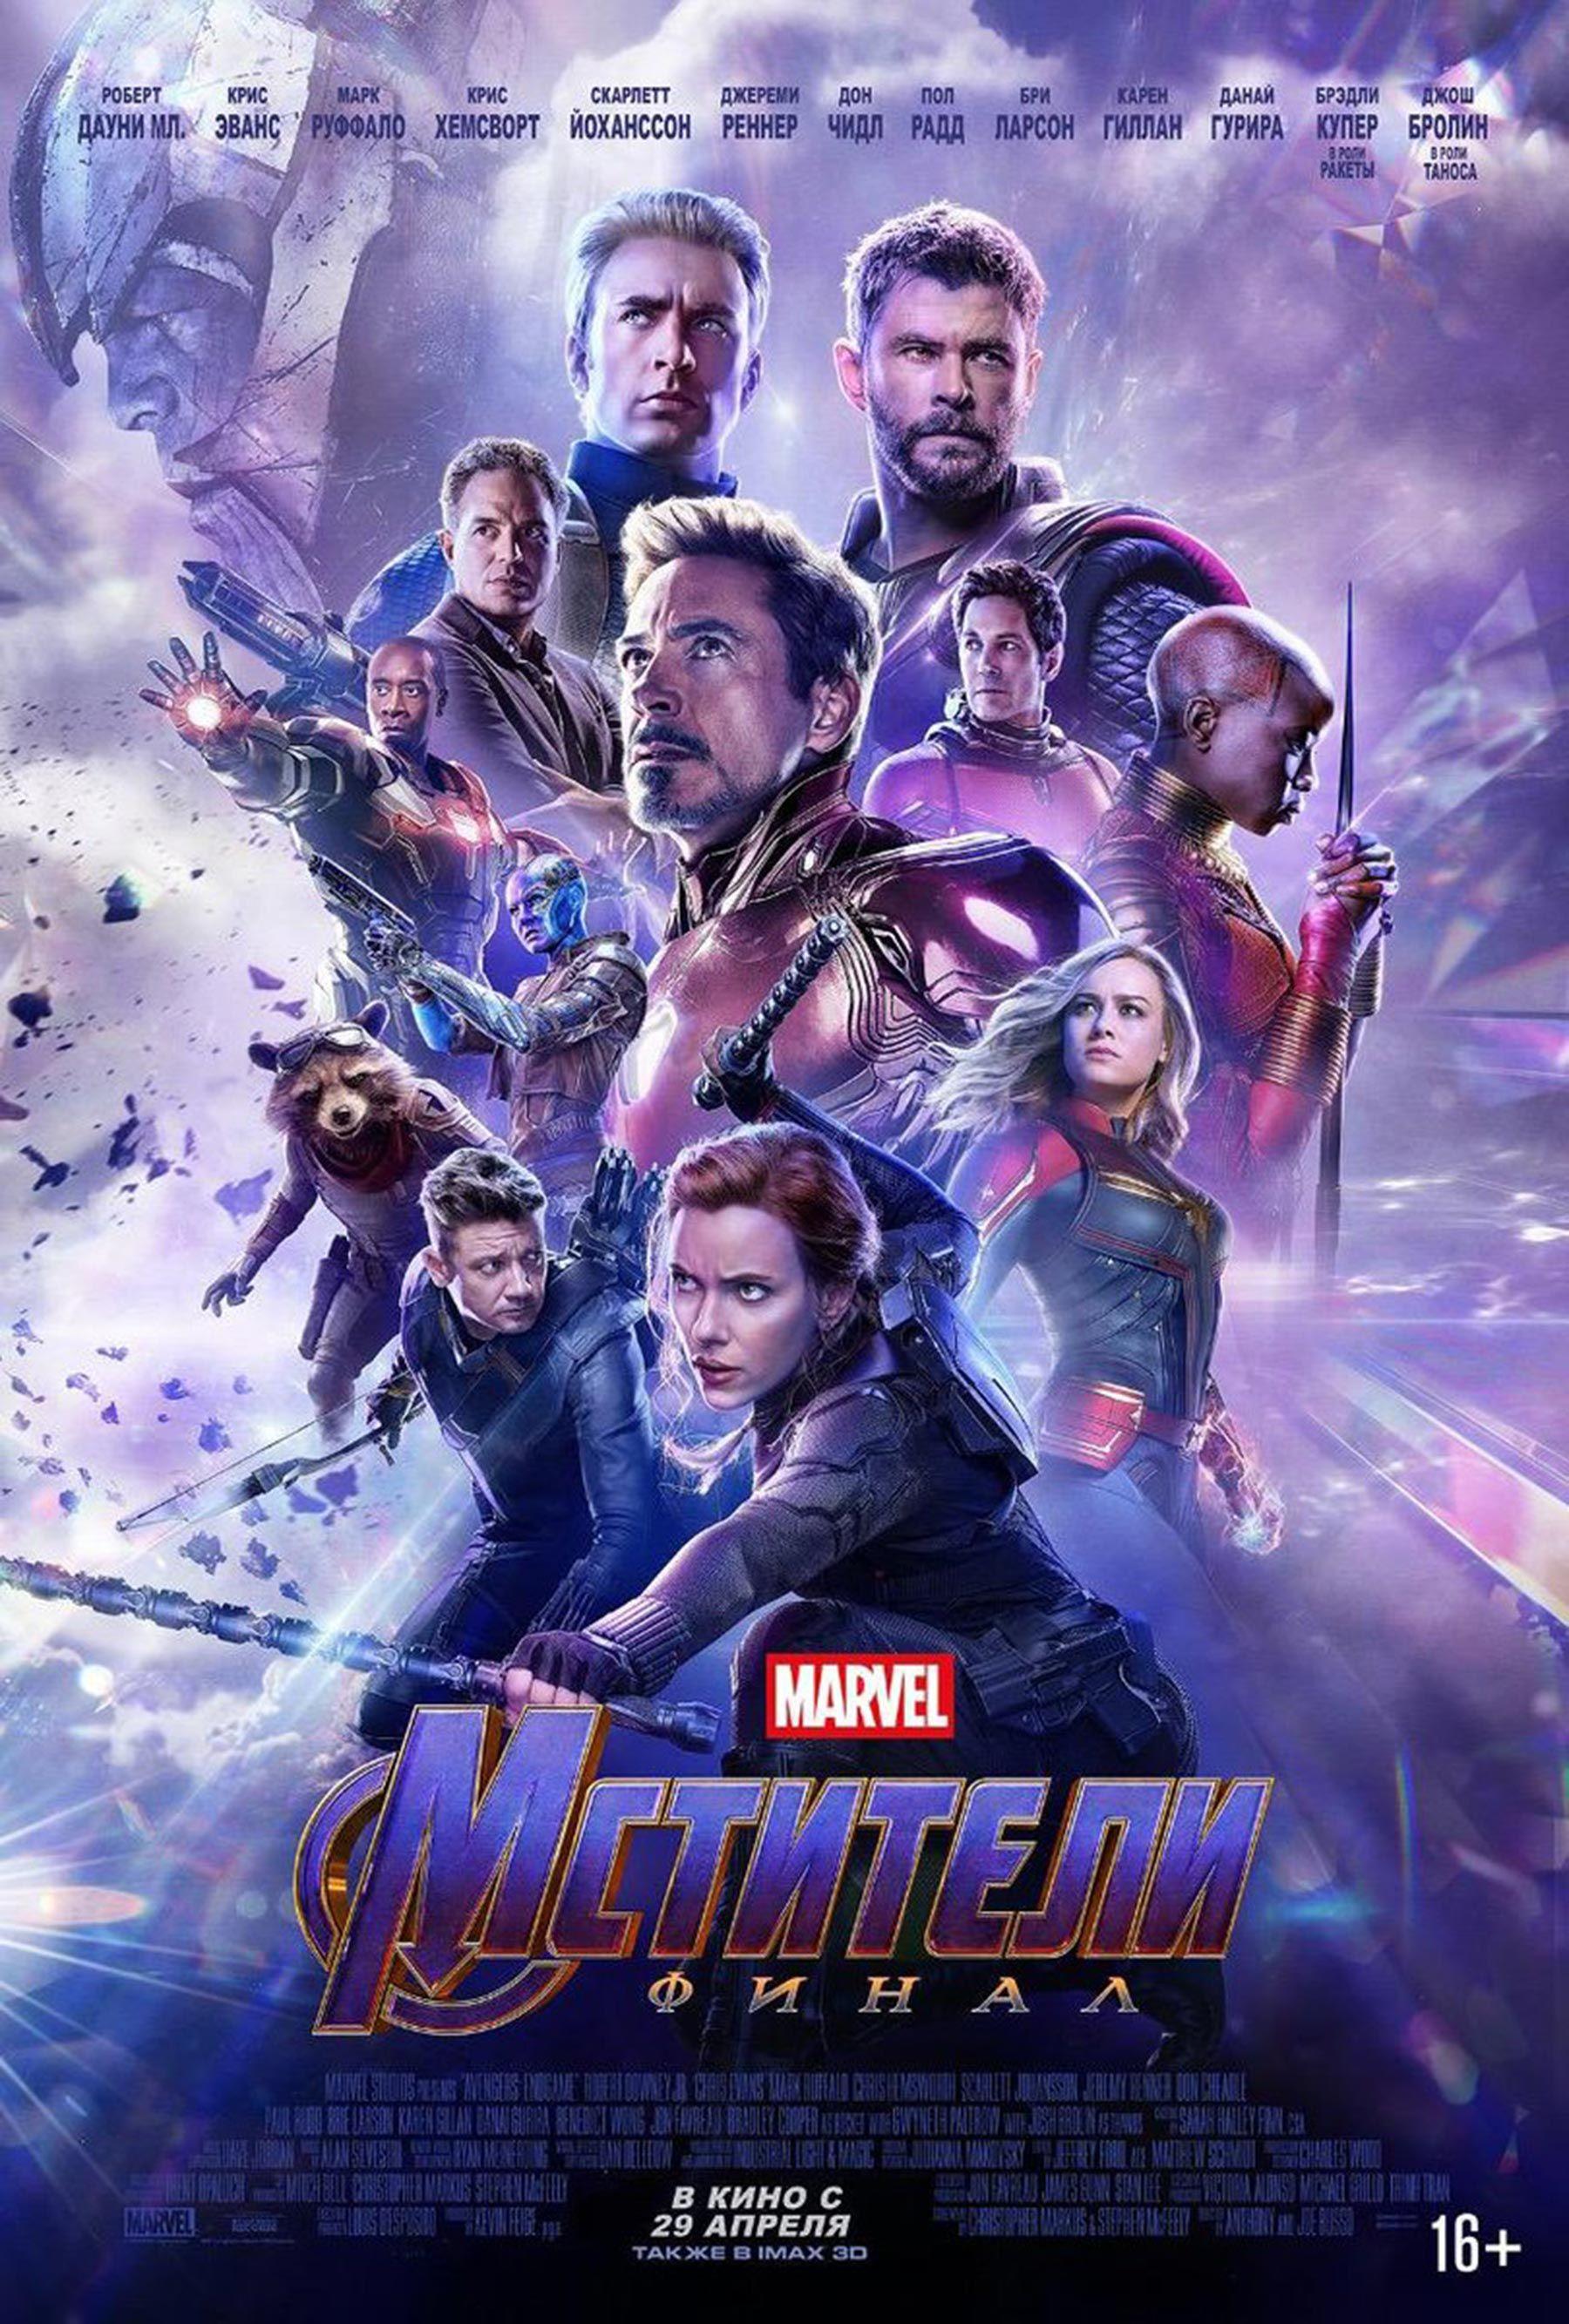 Original Comic Art Energetic Marvel Comics Black Widow Original Art Avengers Winter Soldier Infinity Endgame Other Original Comic Art